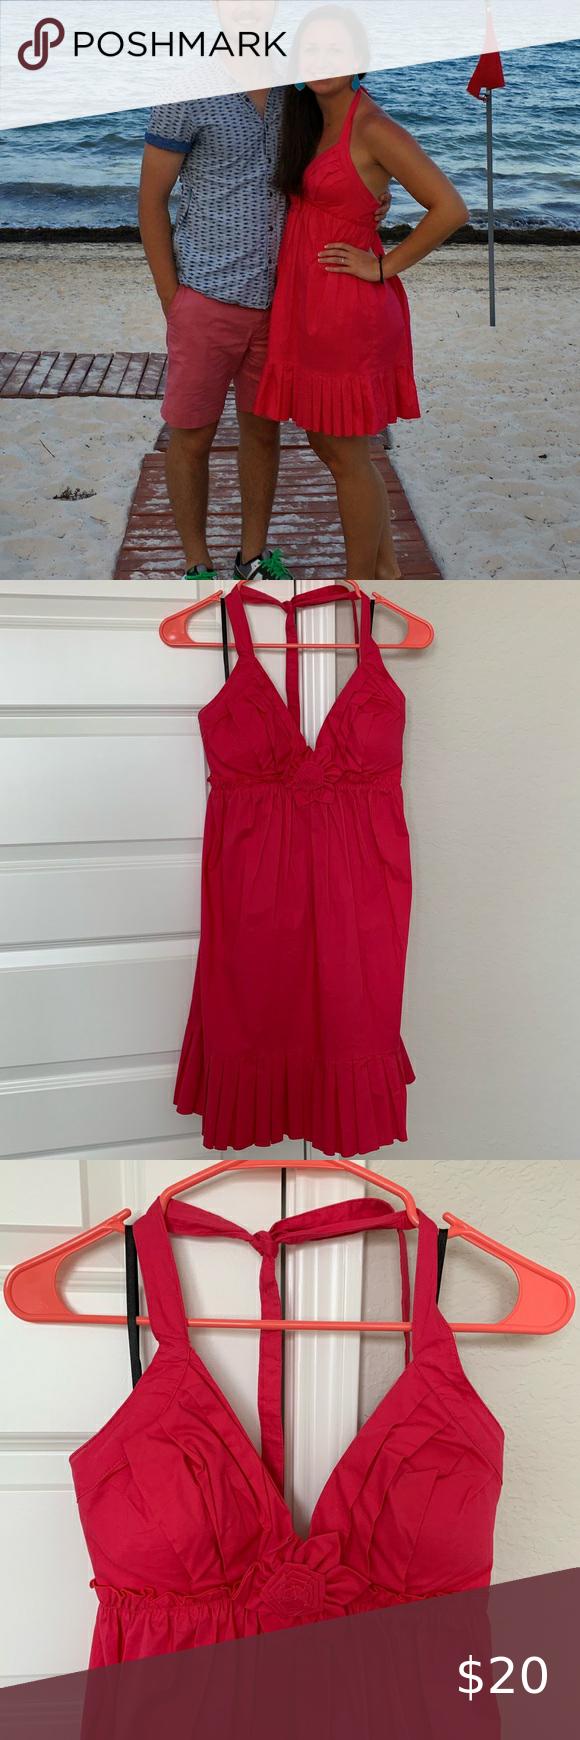 Hot Pink Summer Dress Pink Summer Dress Summer Dresses Beautiful Red Dresses [ 1740 x 580 Pixel ]